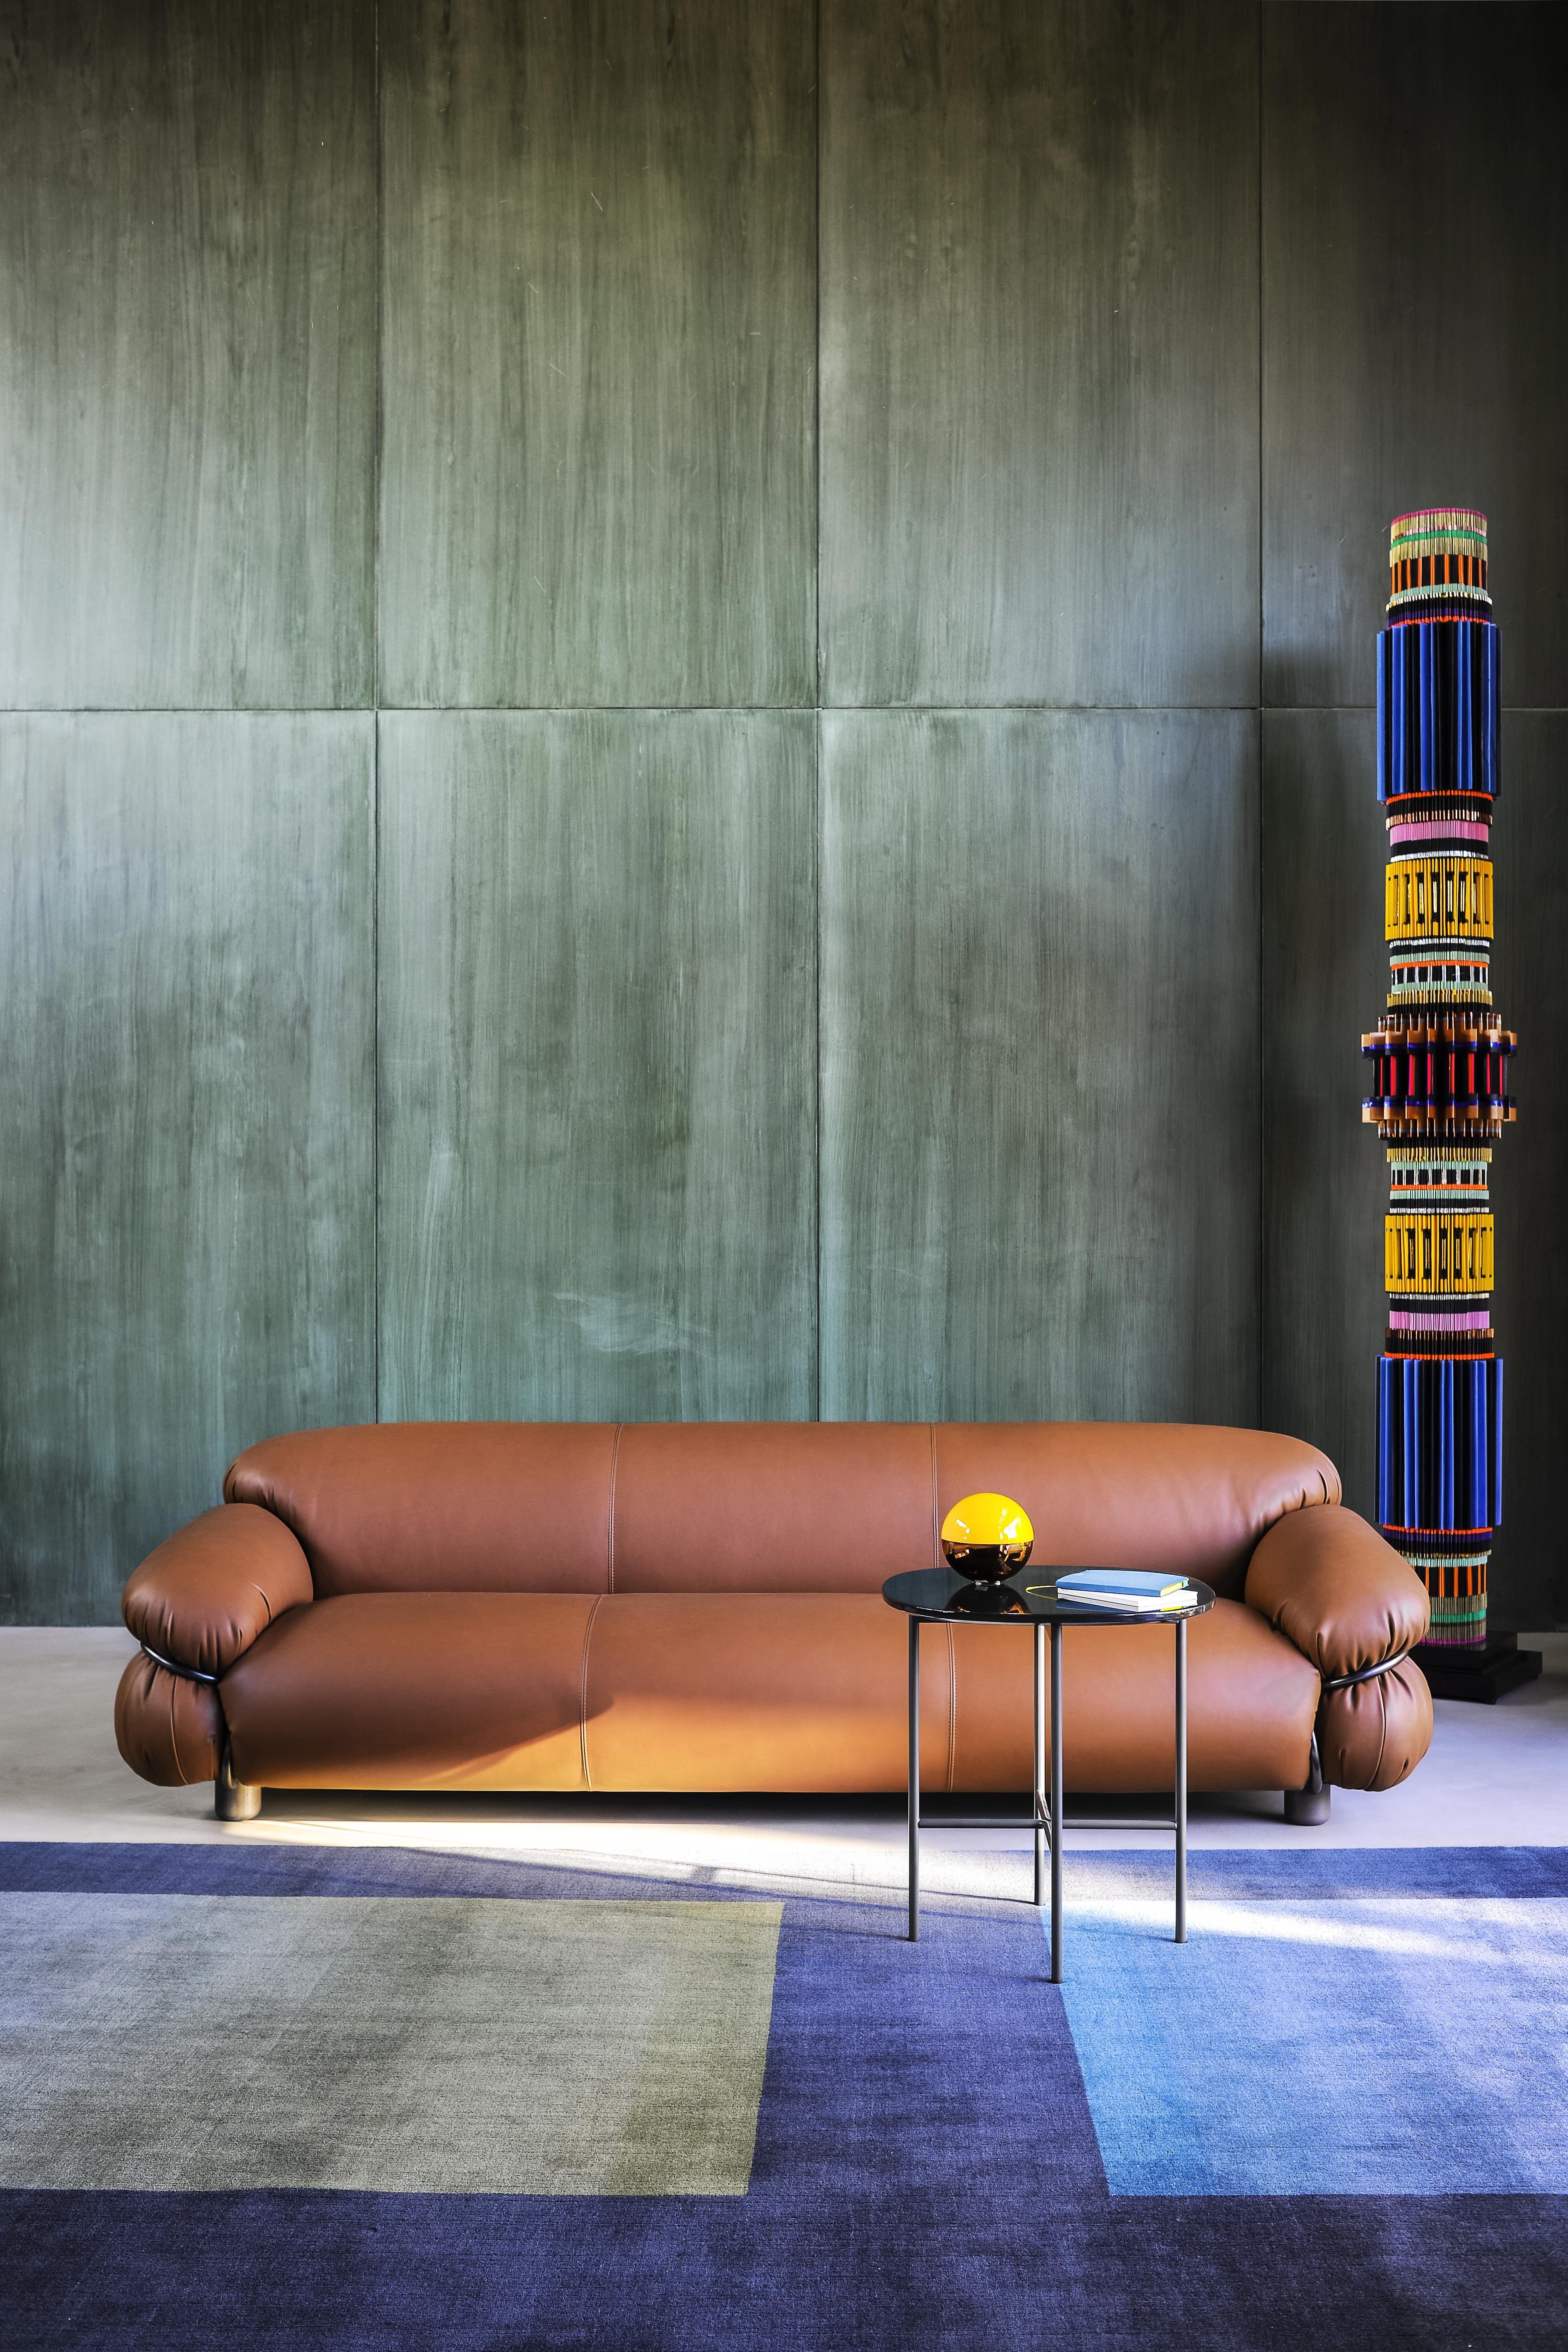 Tacchini Sofa By Gianfranco Frattini, $8,970, Artemest